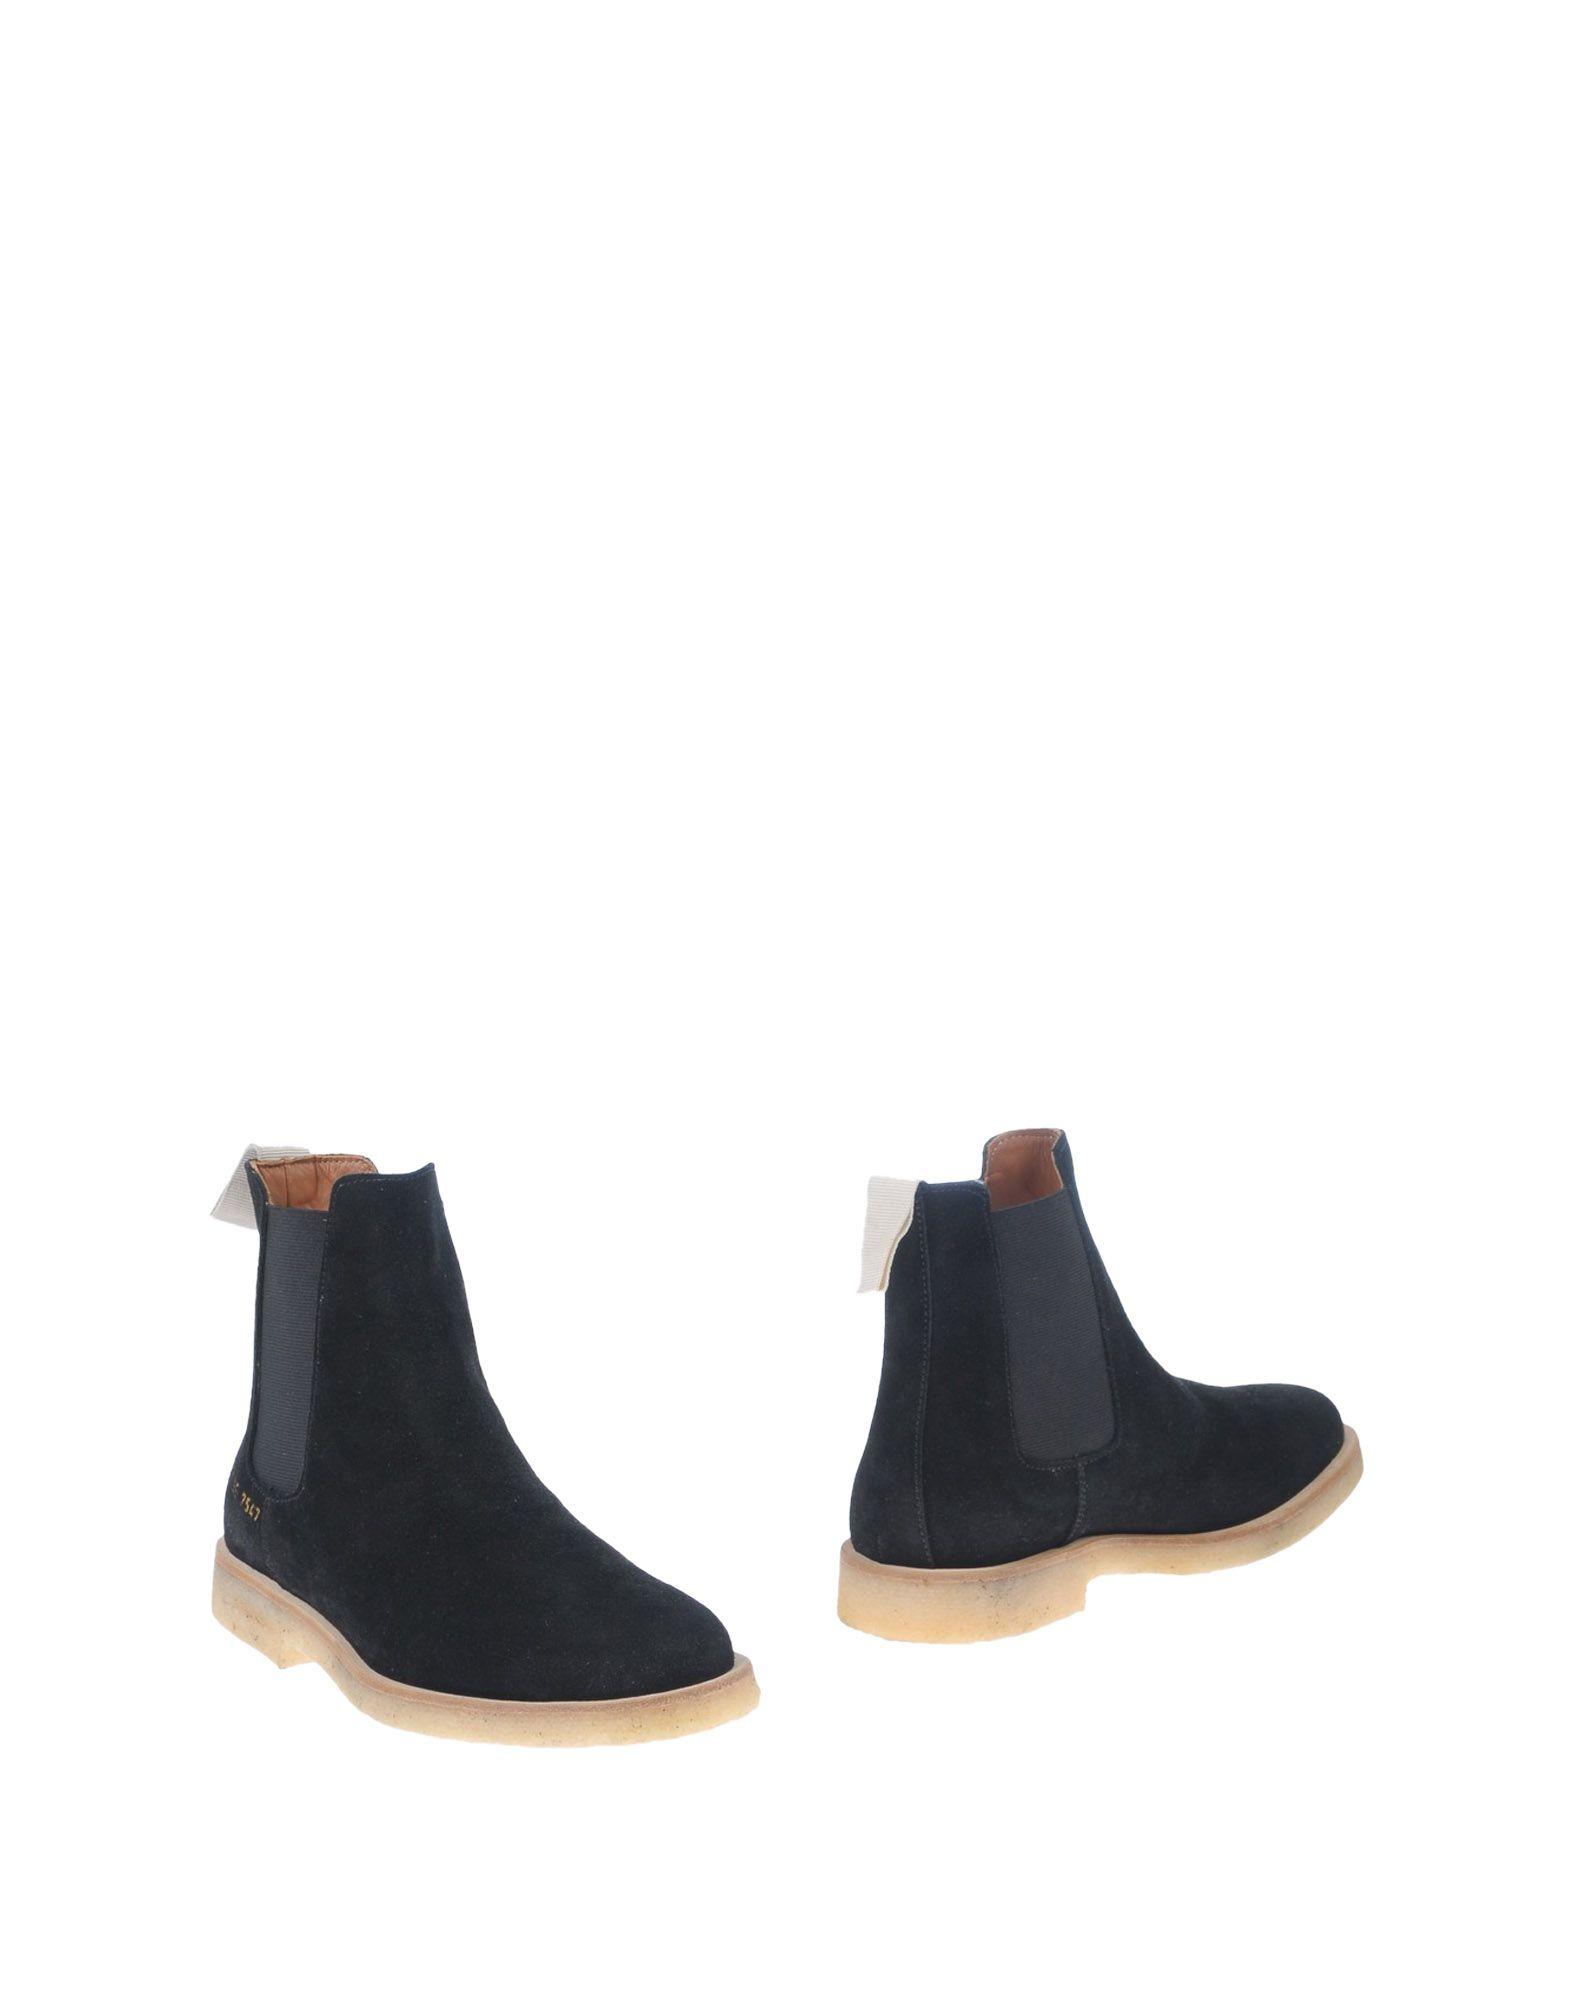 woman by common projects полусапоги и высокие ботинки WOMAN by COMMON PROJECTS Полусапоги и высокие ботинки